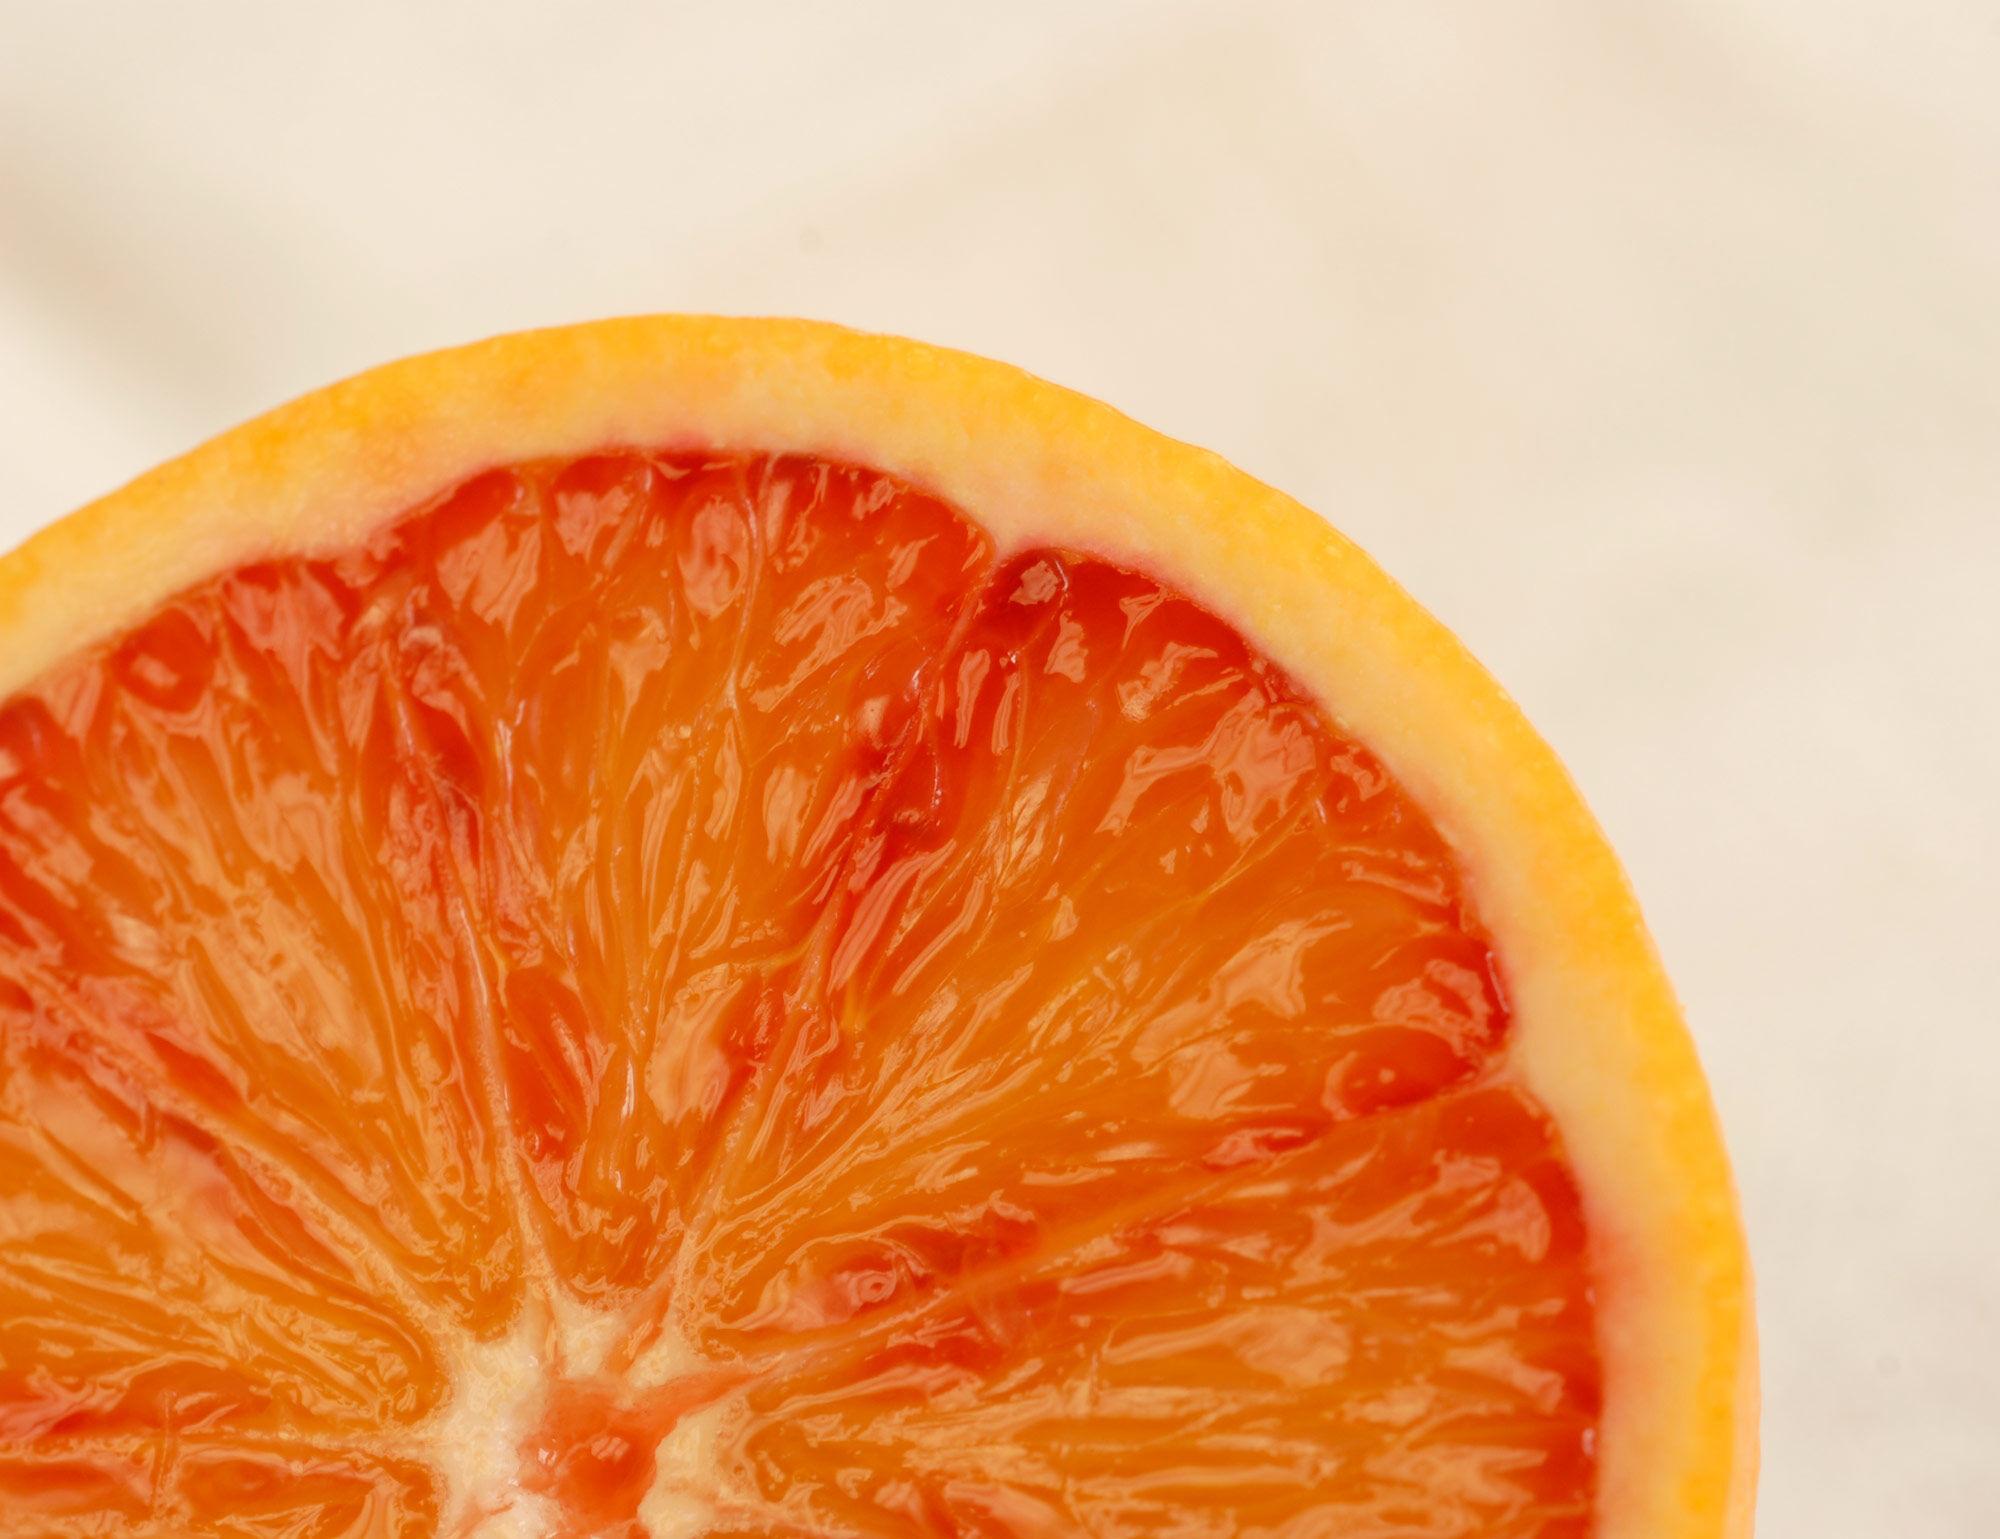 Apelsinskiva